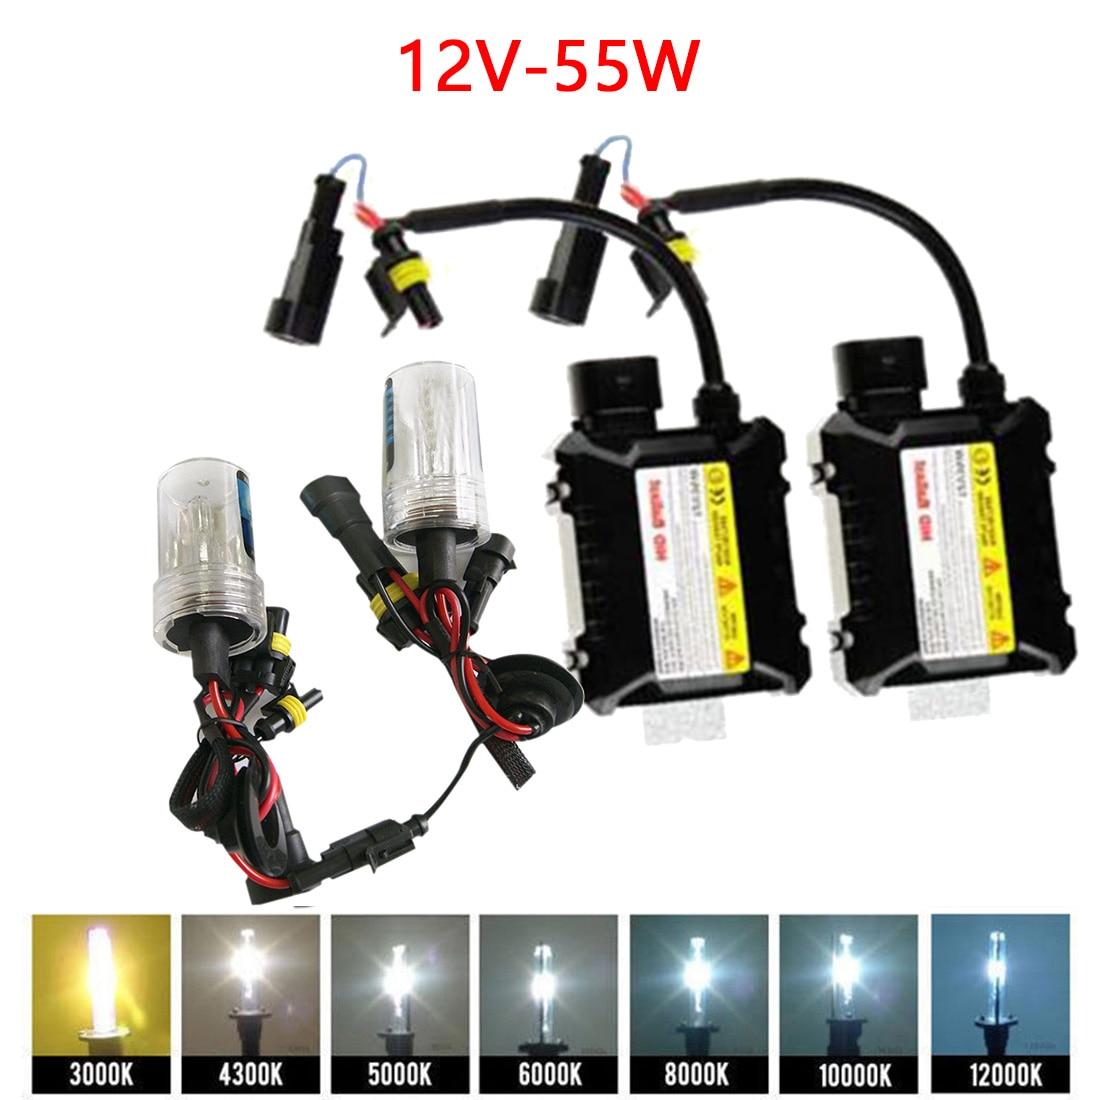 Tonewan New H7 Xenon HID Kit 55W H1 H3 H4 H8 H9 H11 9005 HB3 9006 HB4 881 H27 lamp for car headlight car styling xenon H7